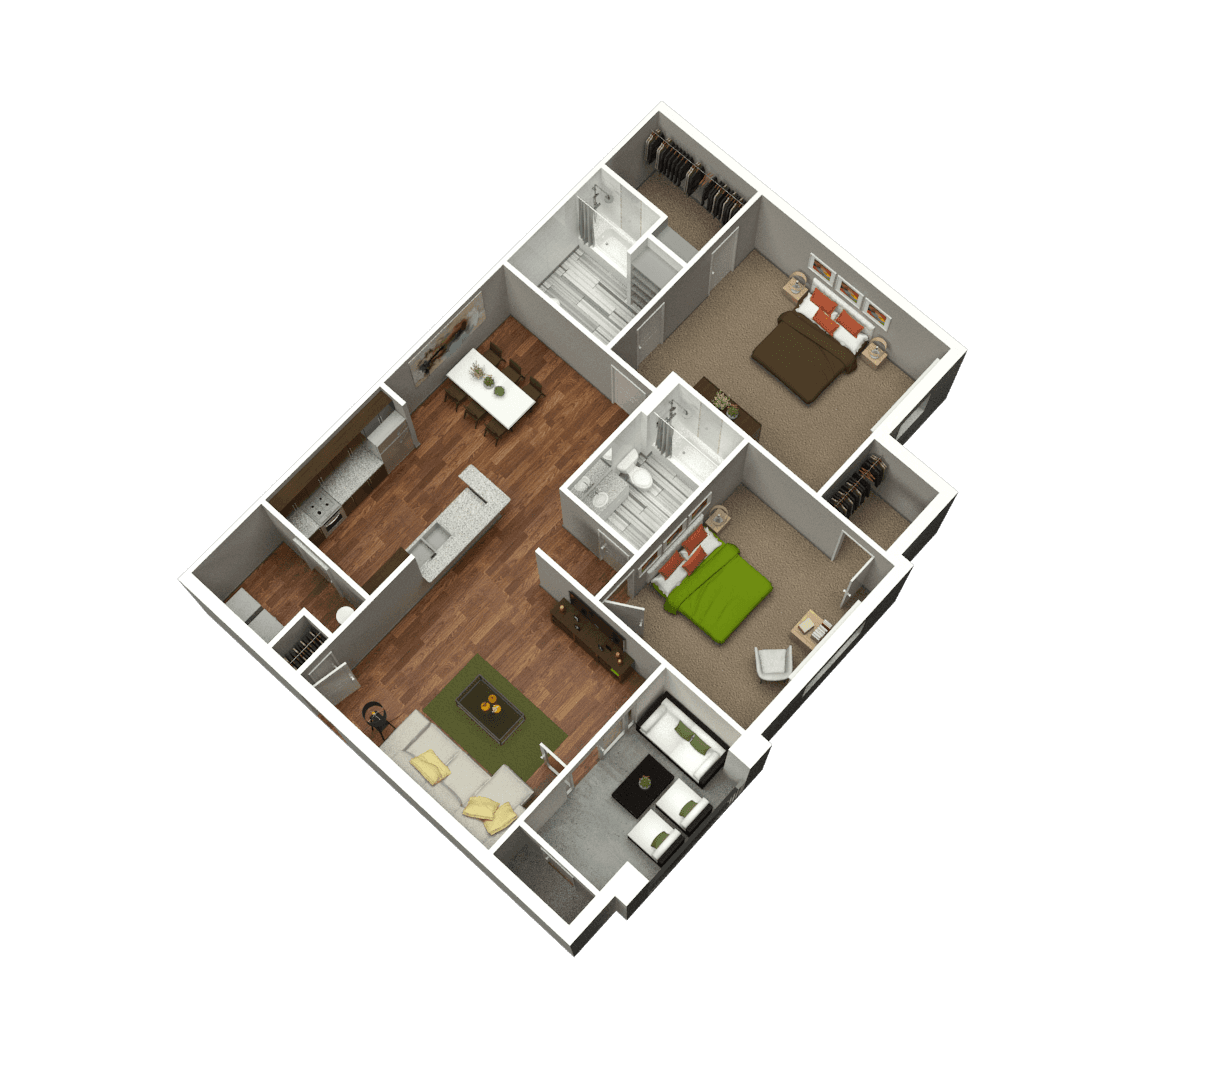 Apartments In Birmingham: Branchwater Apartments Birmingham, AL